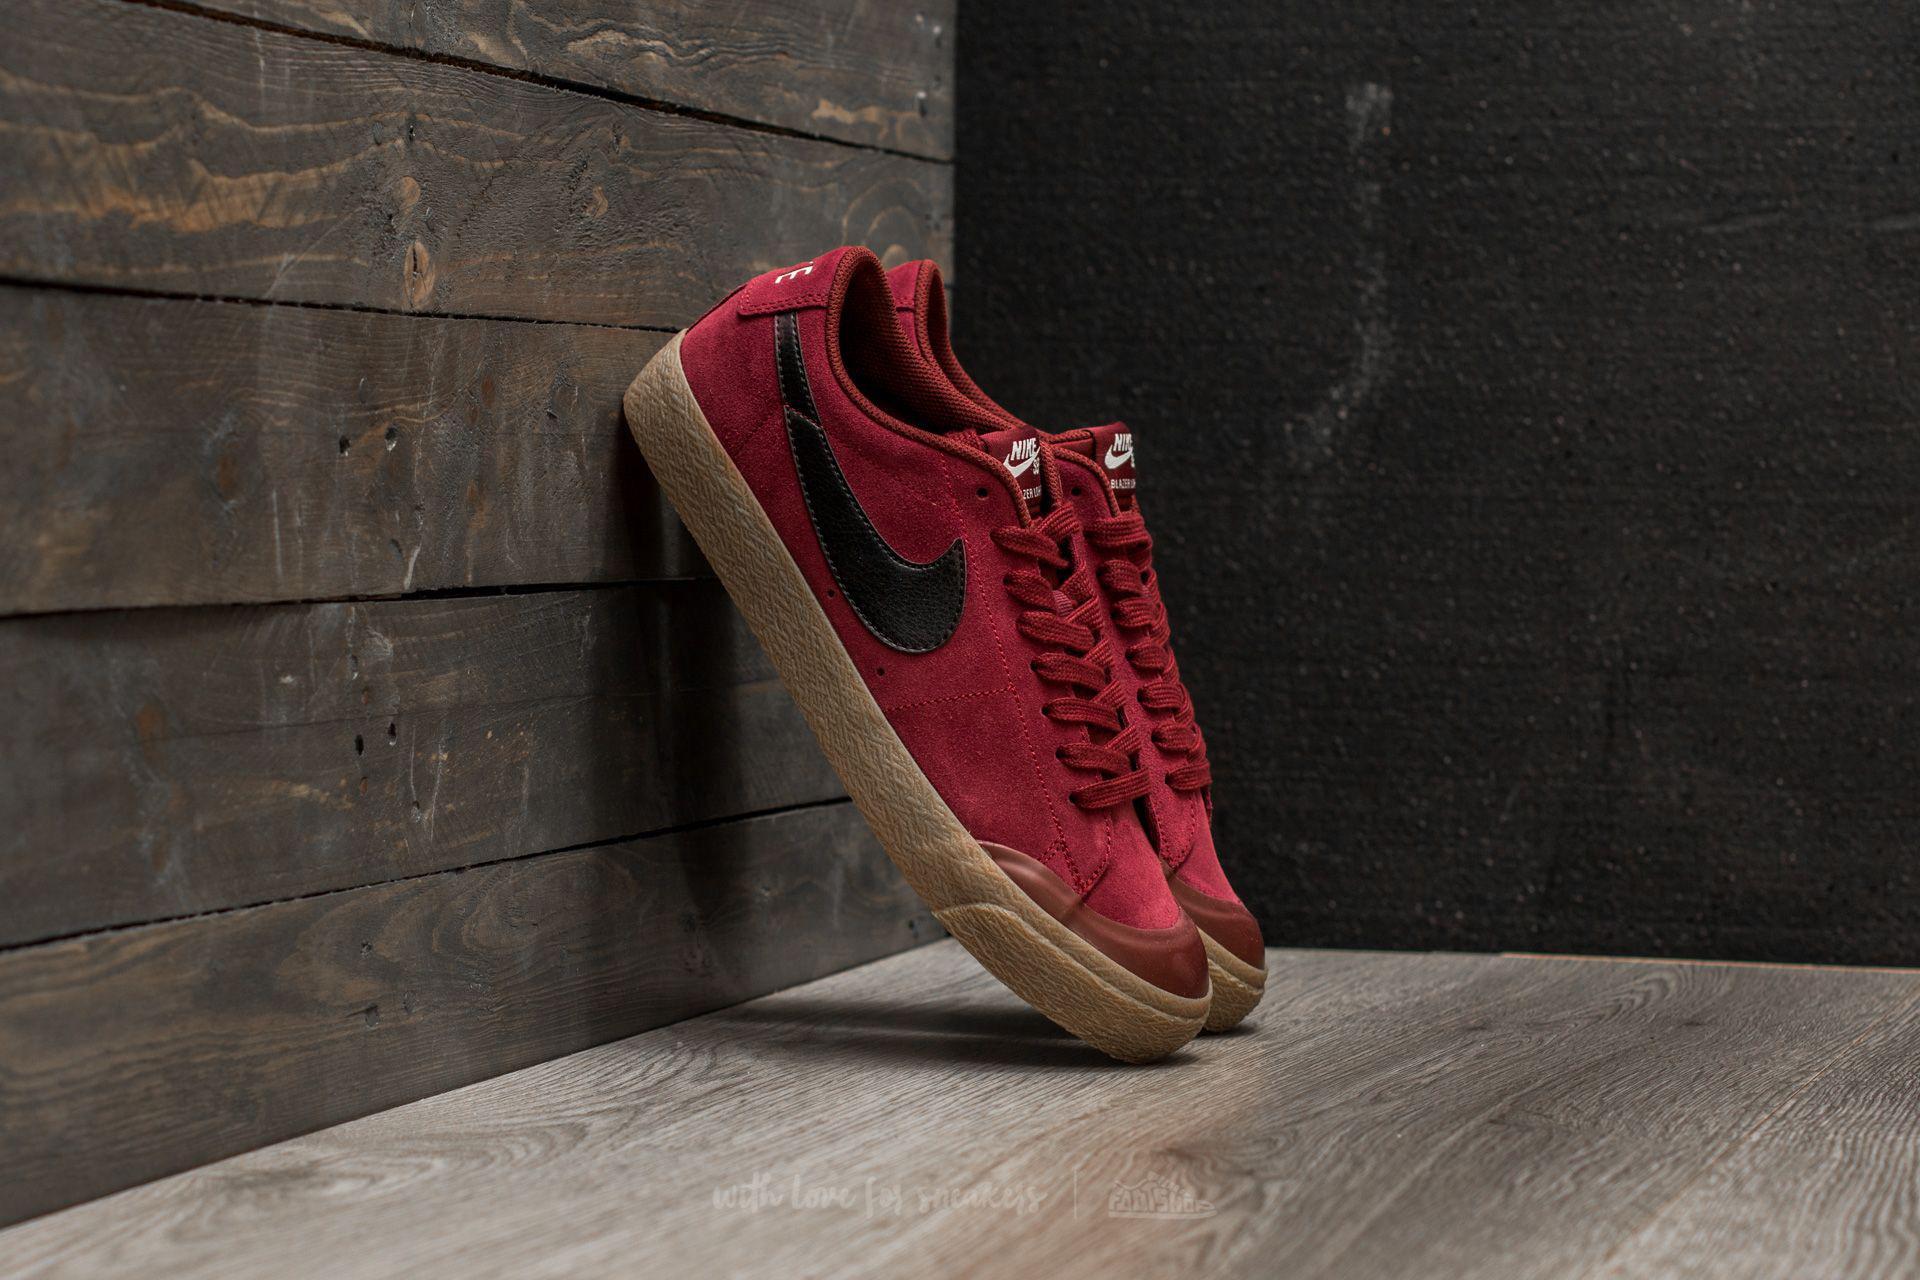 b87d7b7e2dd9d Lyst - Nike Sb Blazer Zoom Low Xt Dark Team Red  Black in Red for Men